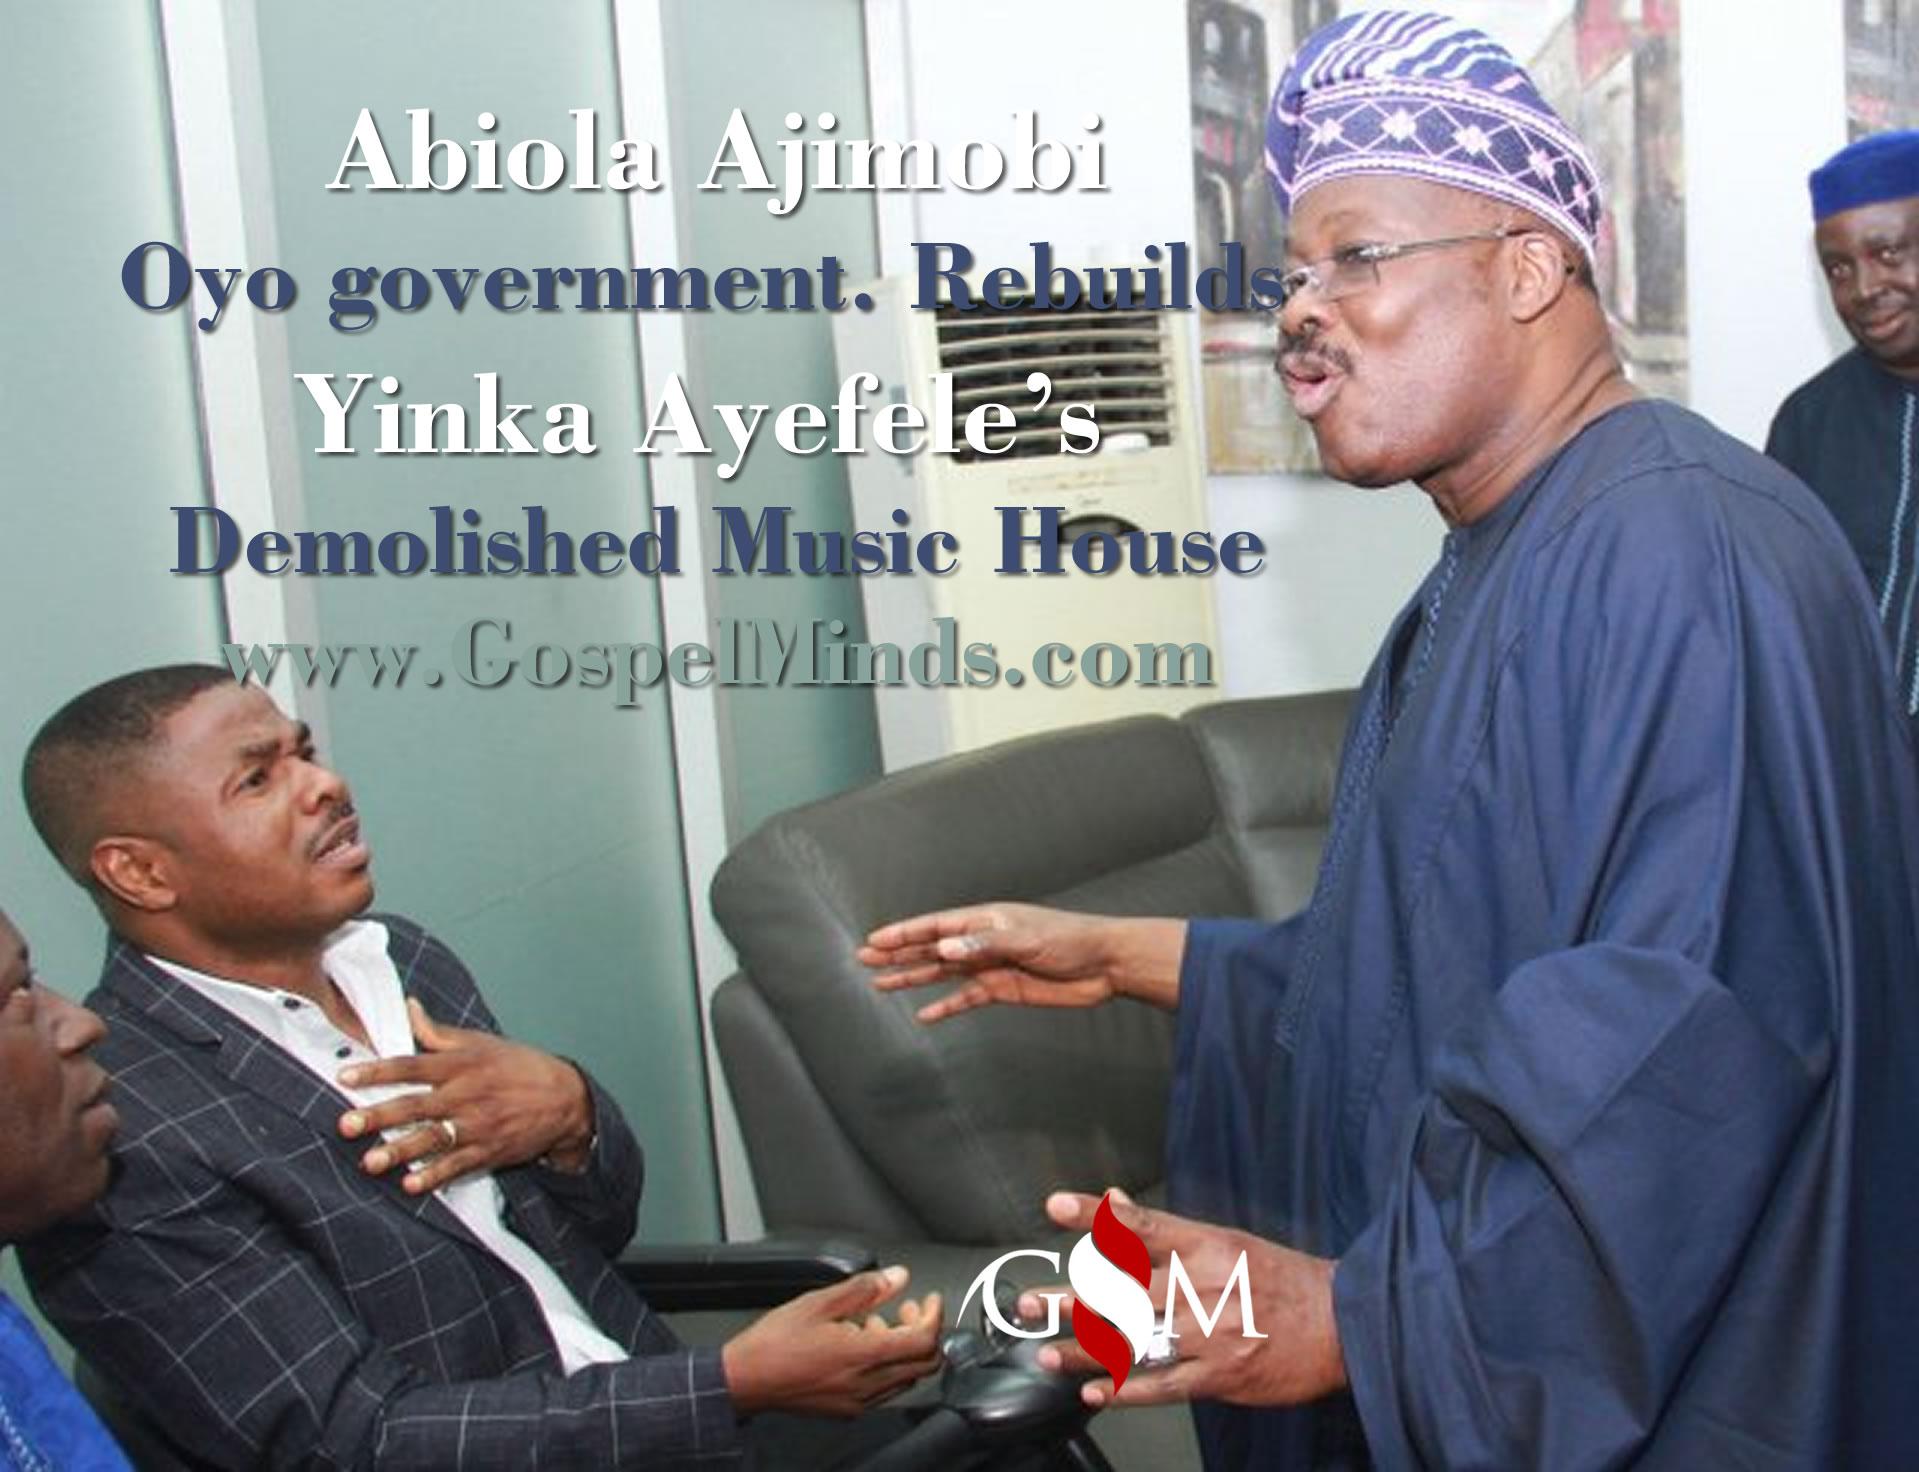 Abiola Ajimobi, Oyo Govt. Rebuilds Yinka Ayefele's demolished Music House